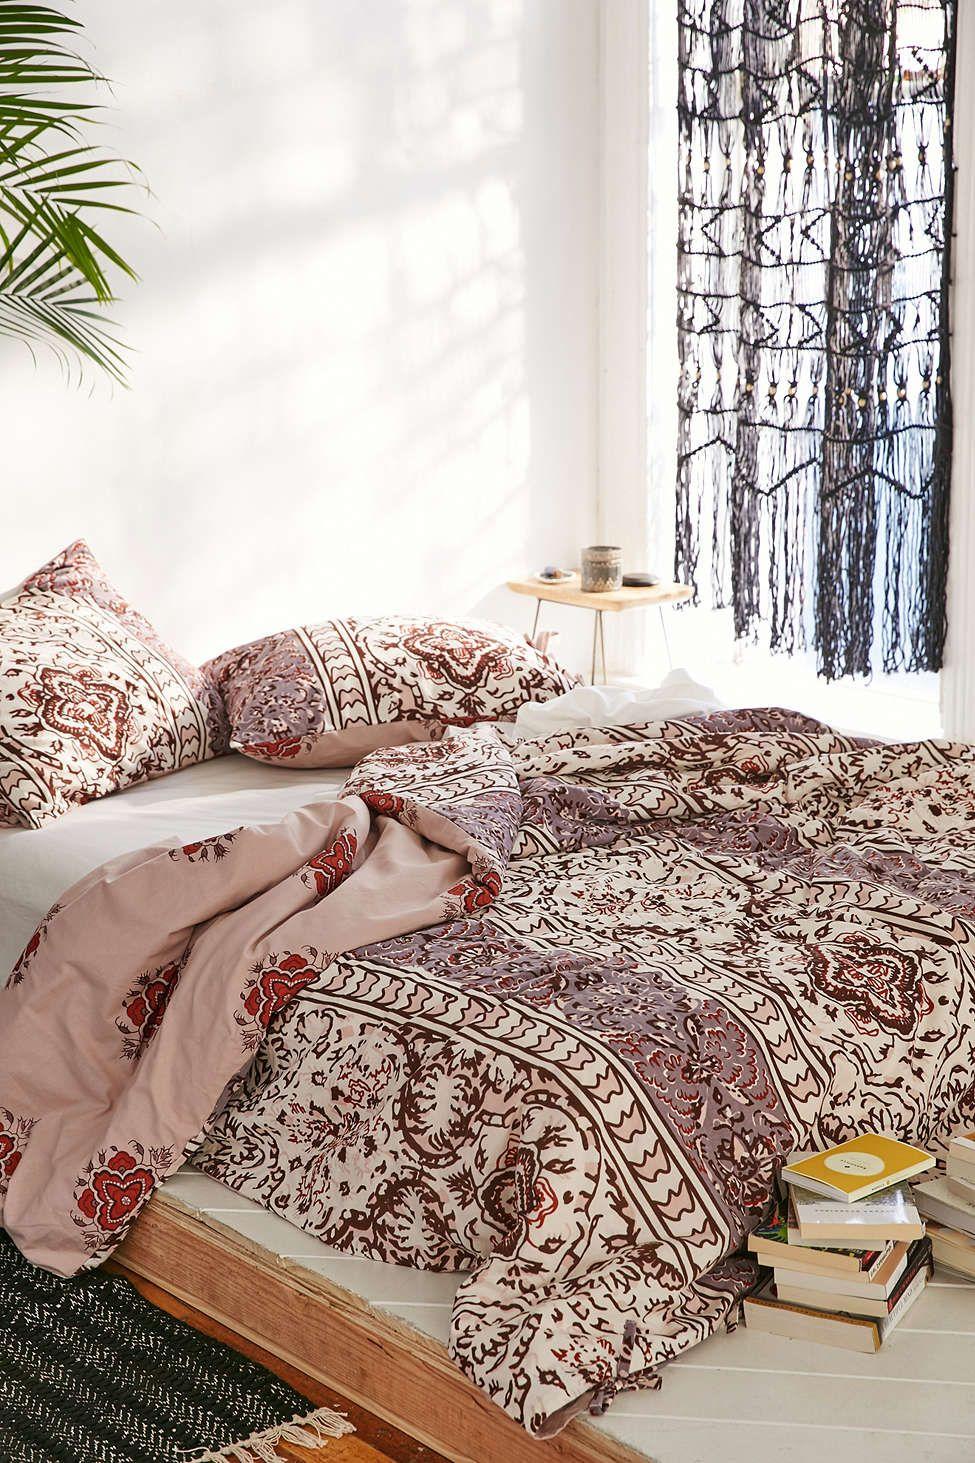 magical thinking boho stripe duvet cover 04 home decor pinterest schlafzimmer bettw sche. Black Bedroom Furniture Sets. Home Design Ideas